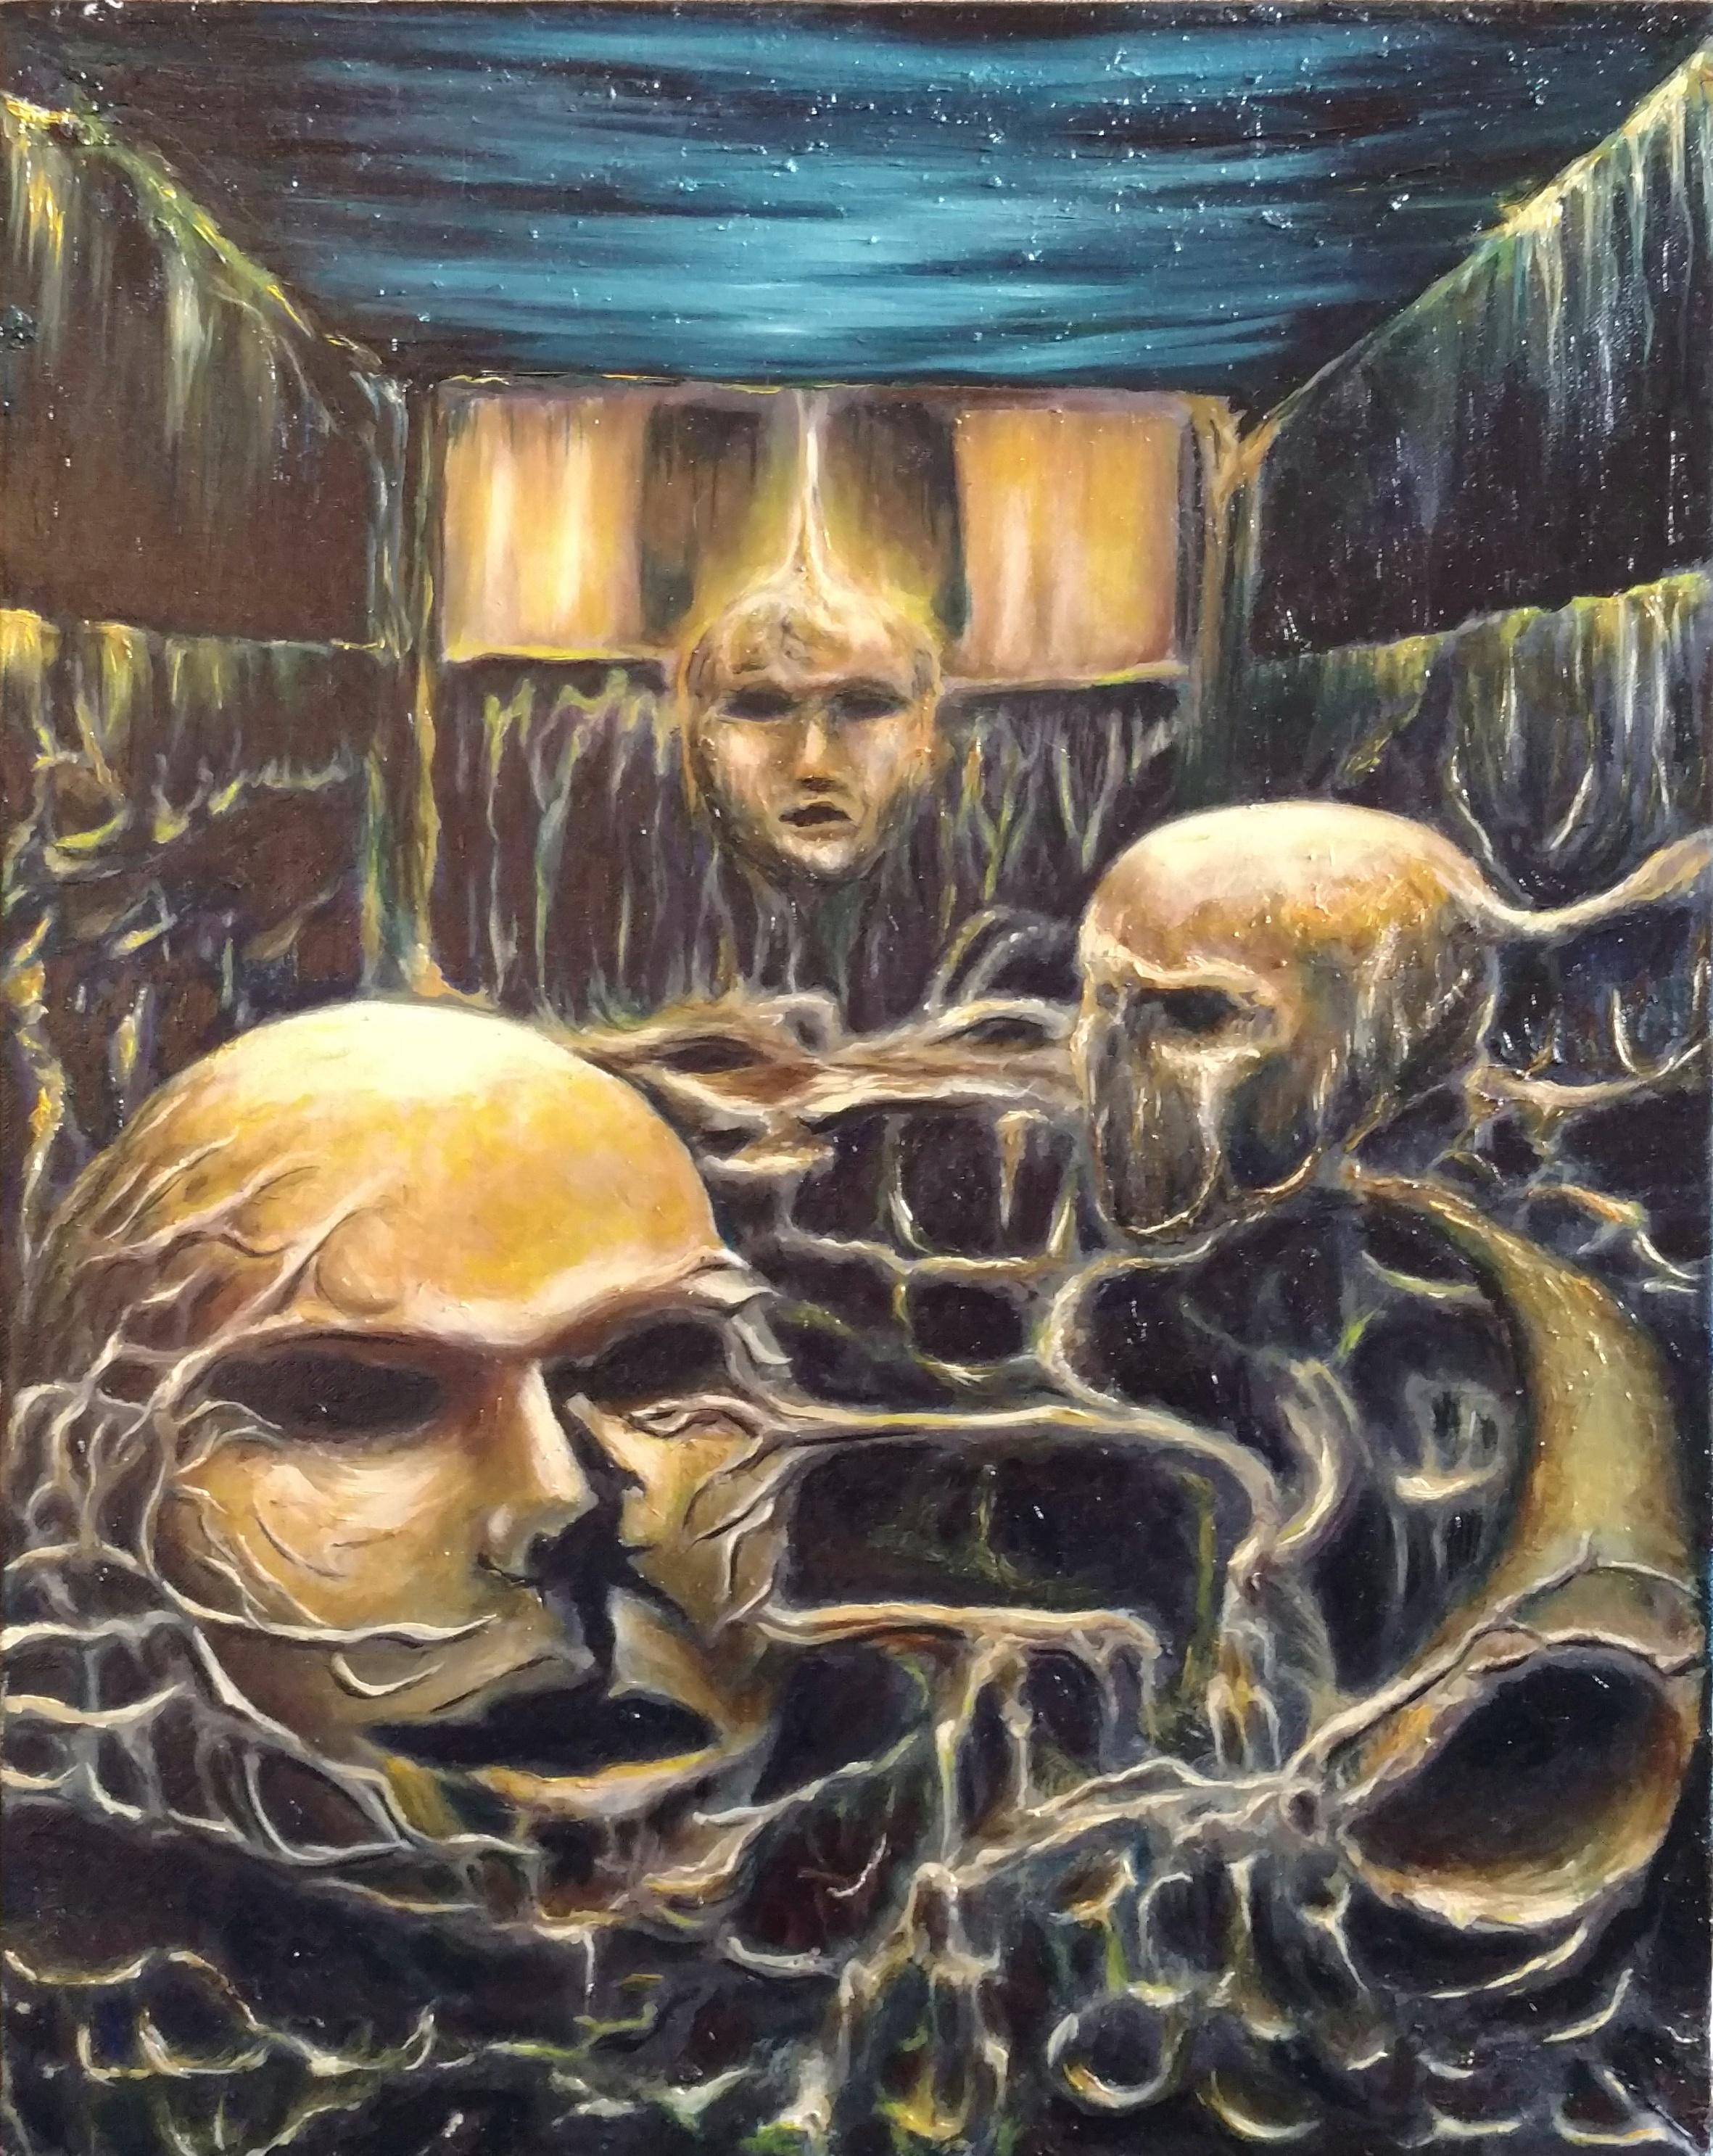 Moulden - Hidden Room - 2018 - Daniel Moulden.jpeg